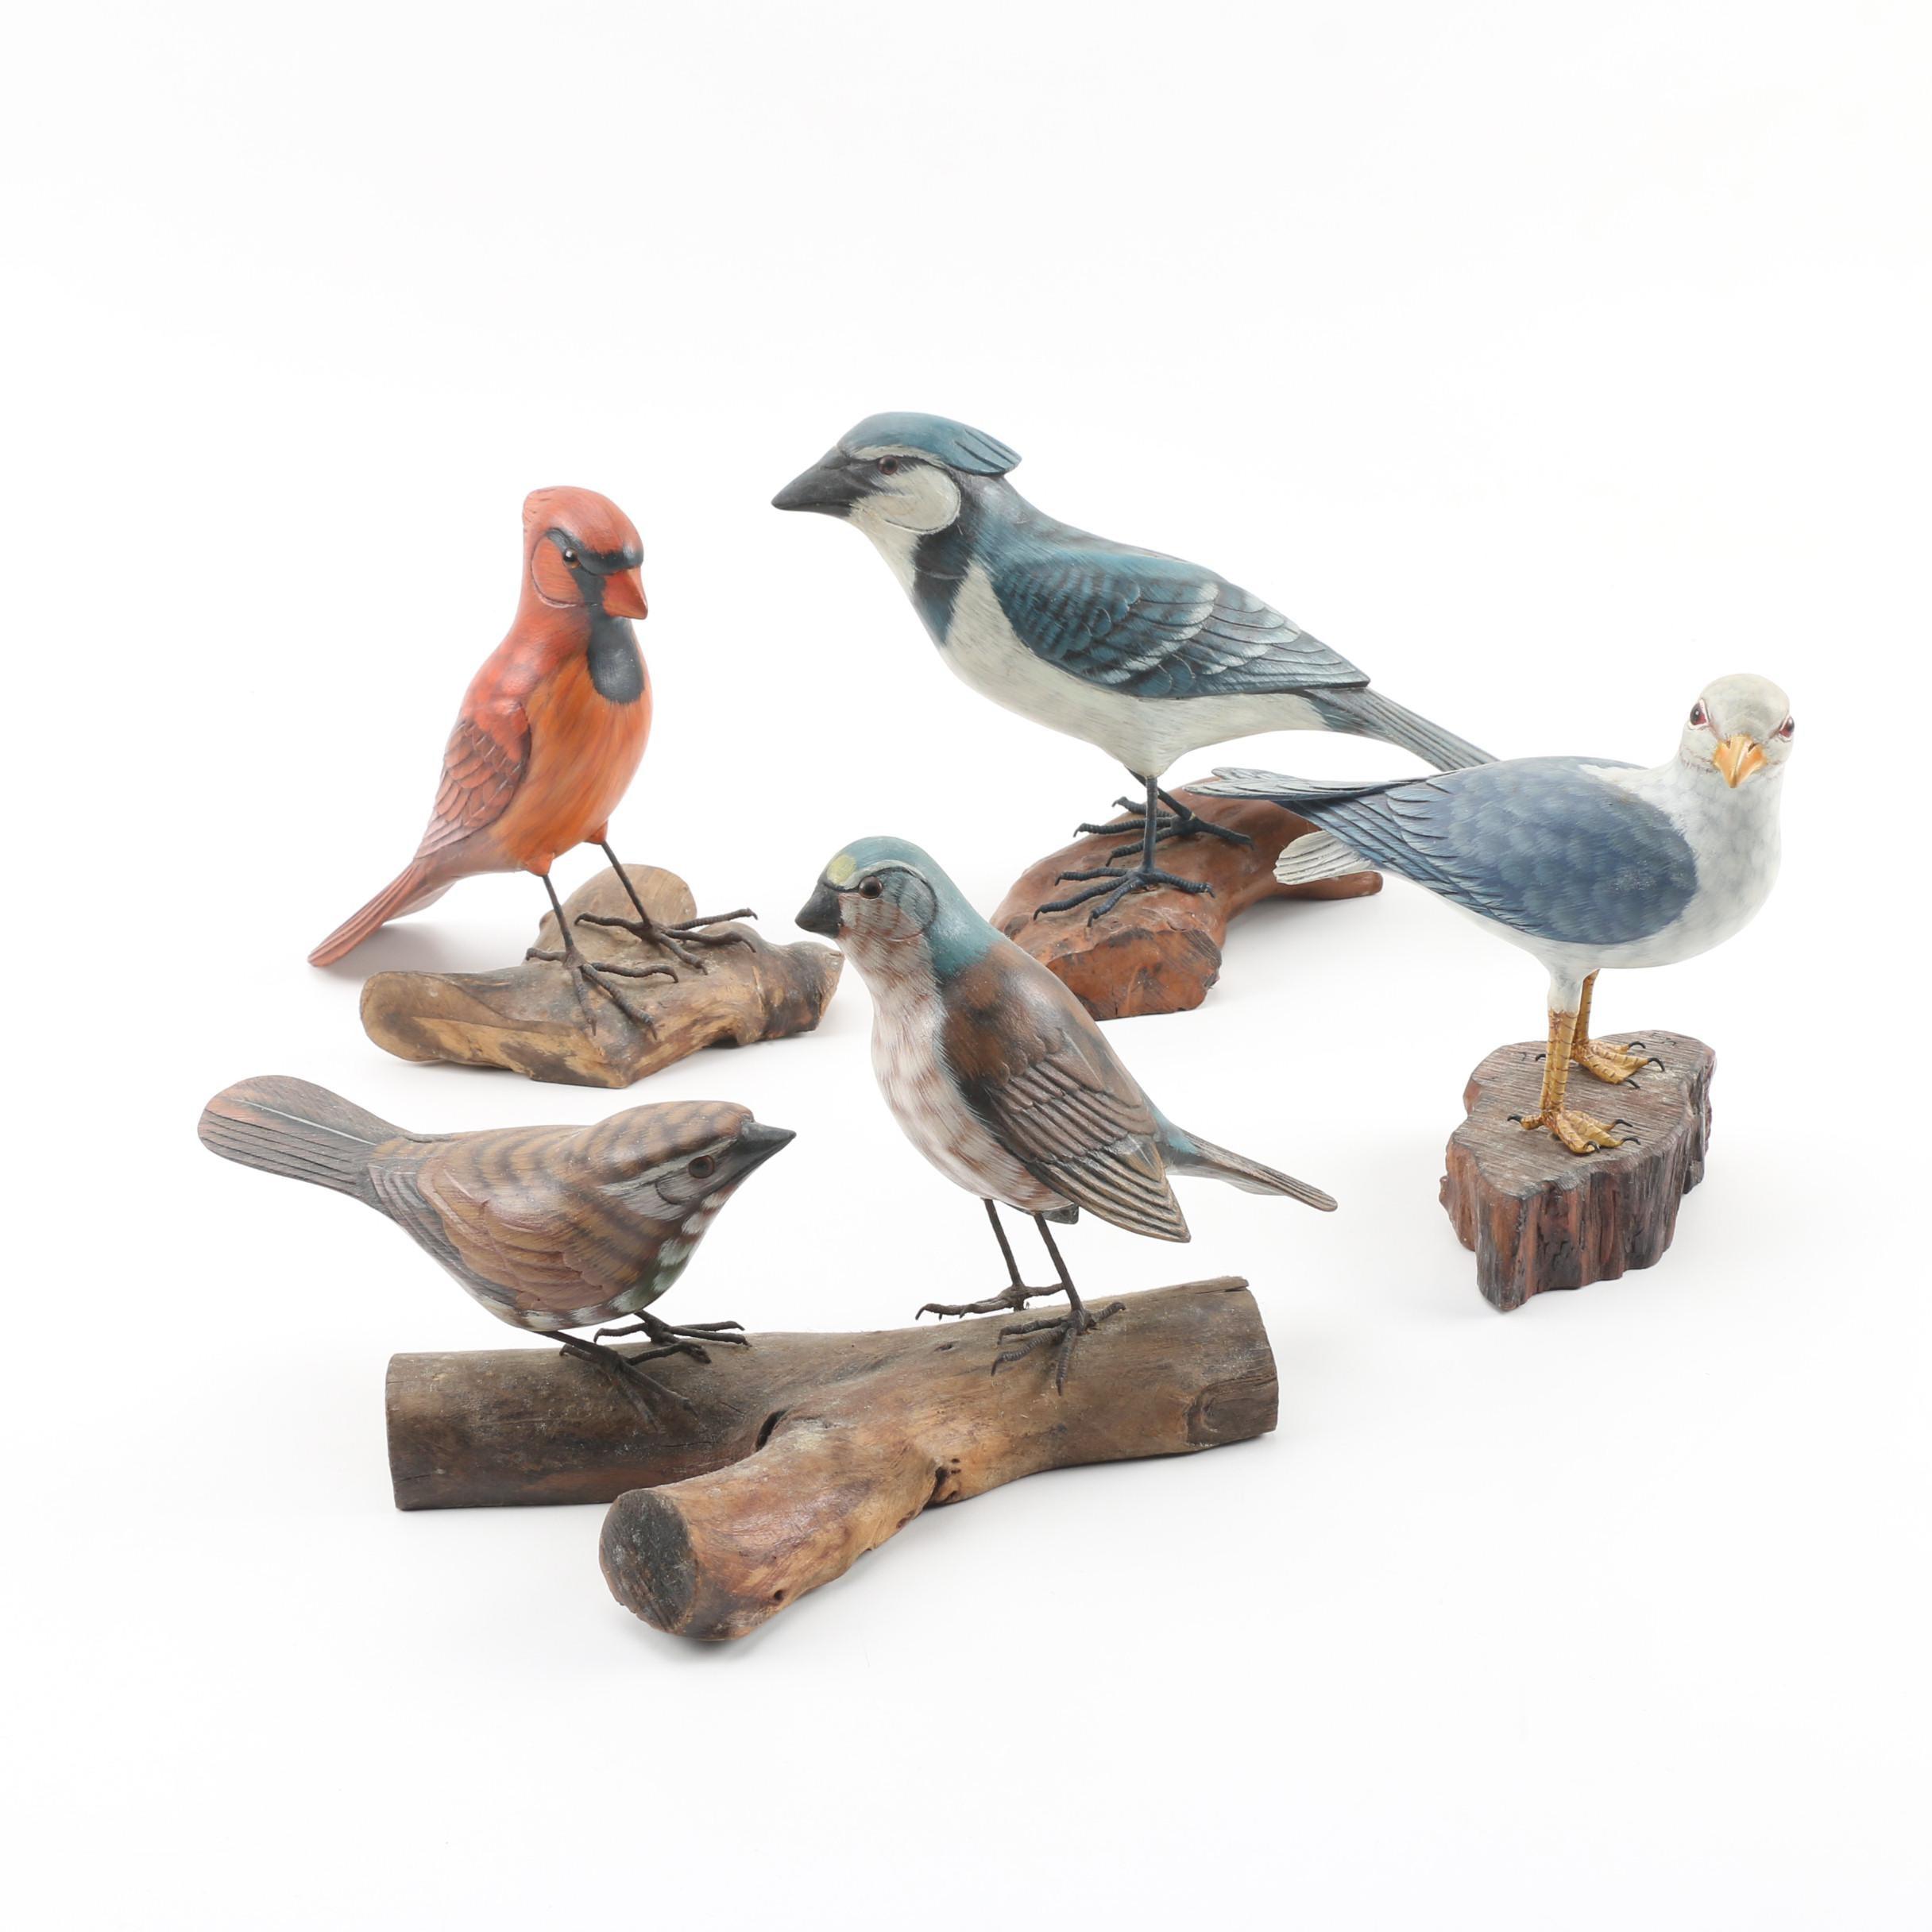 Painted Wooden Bird Figurines